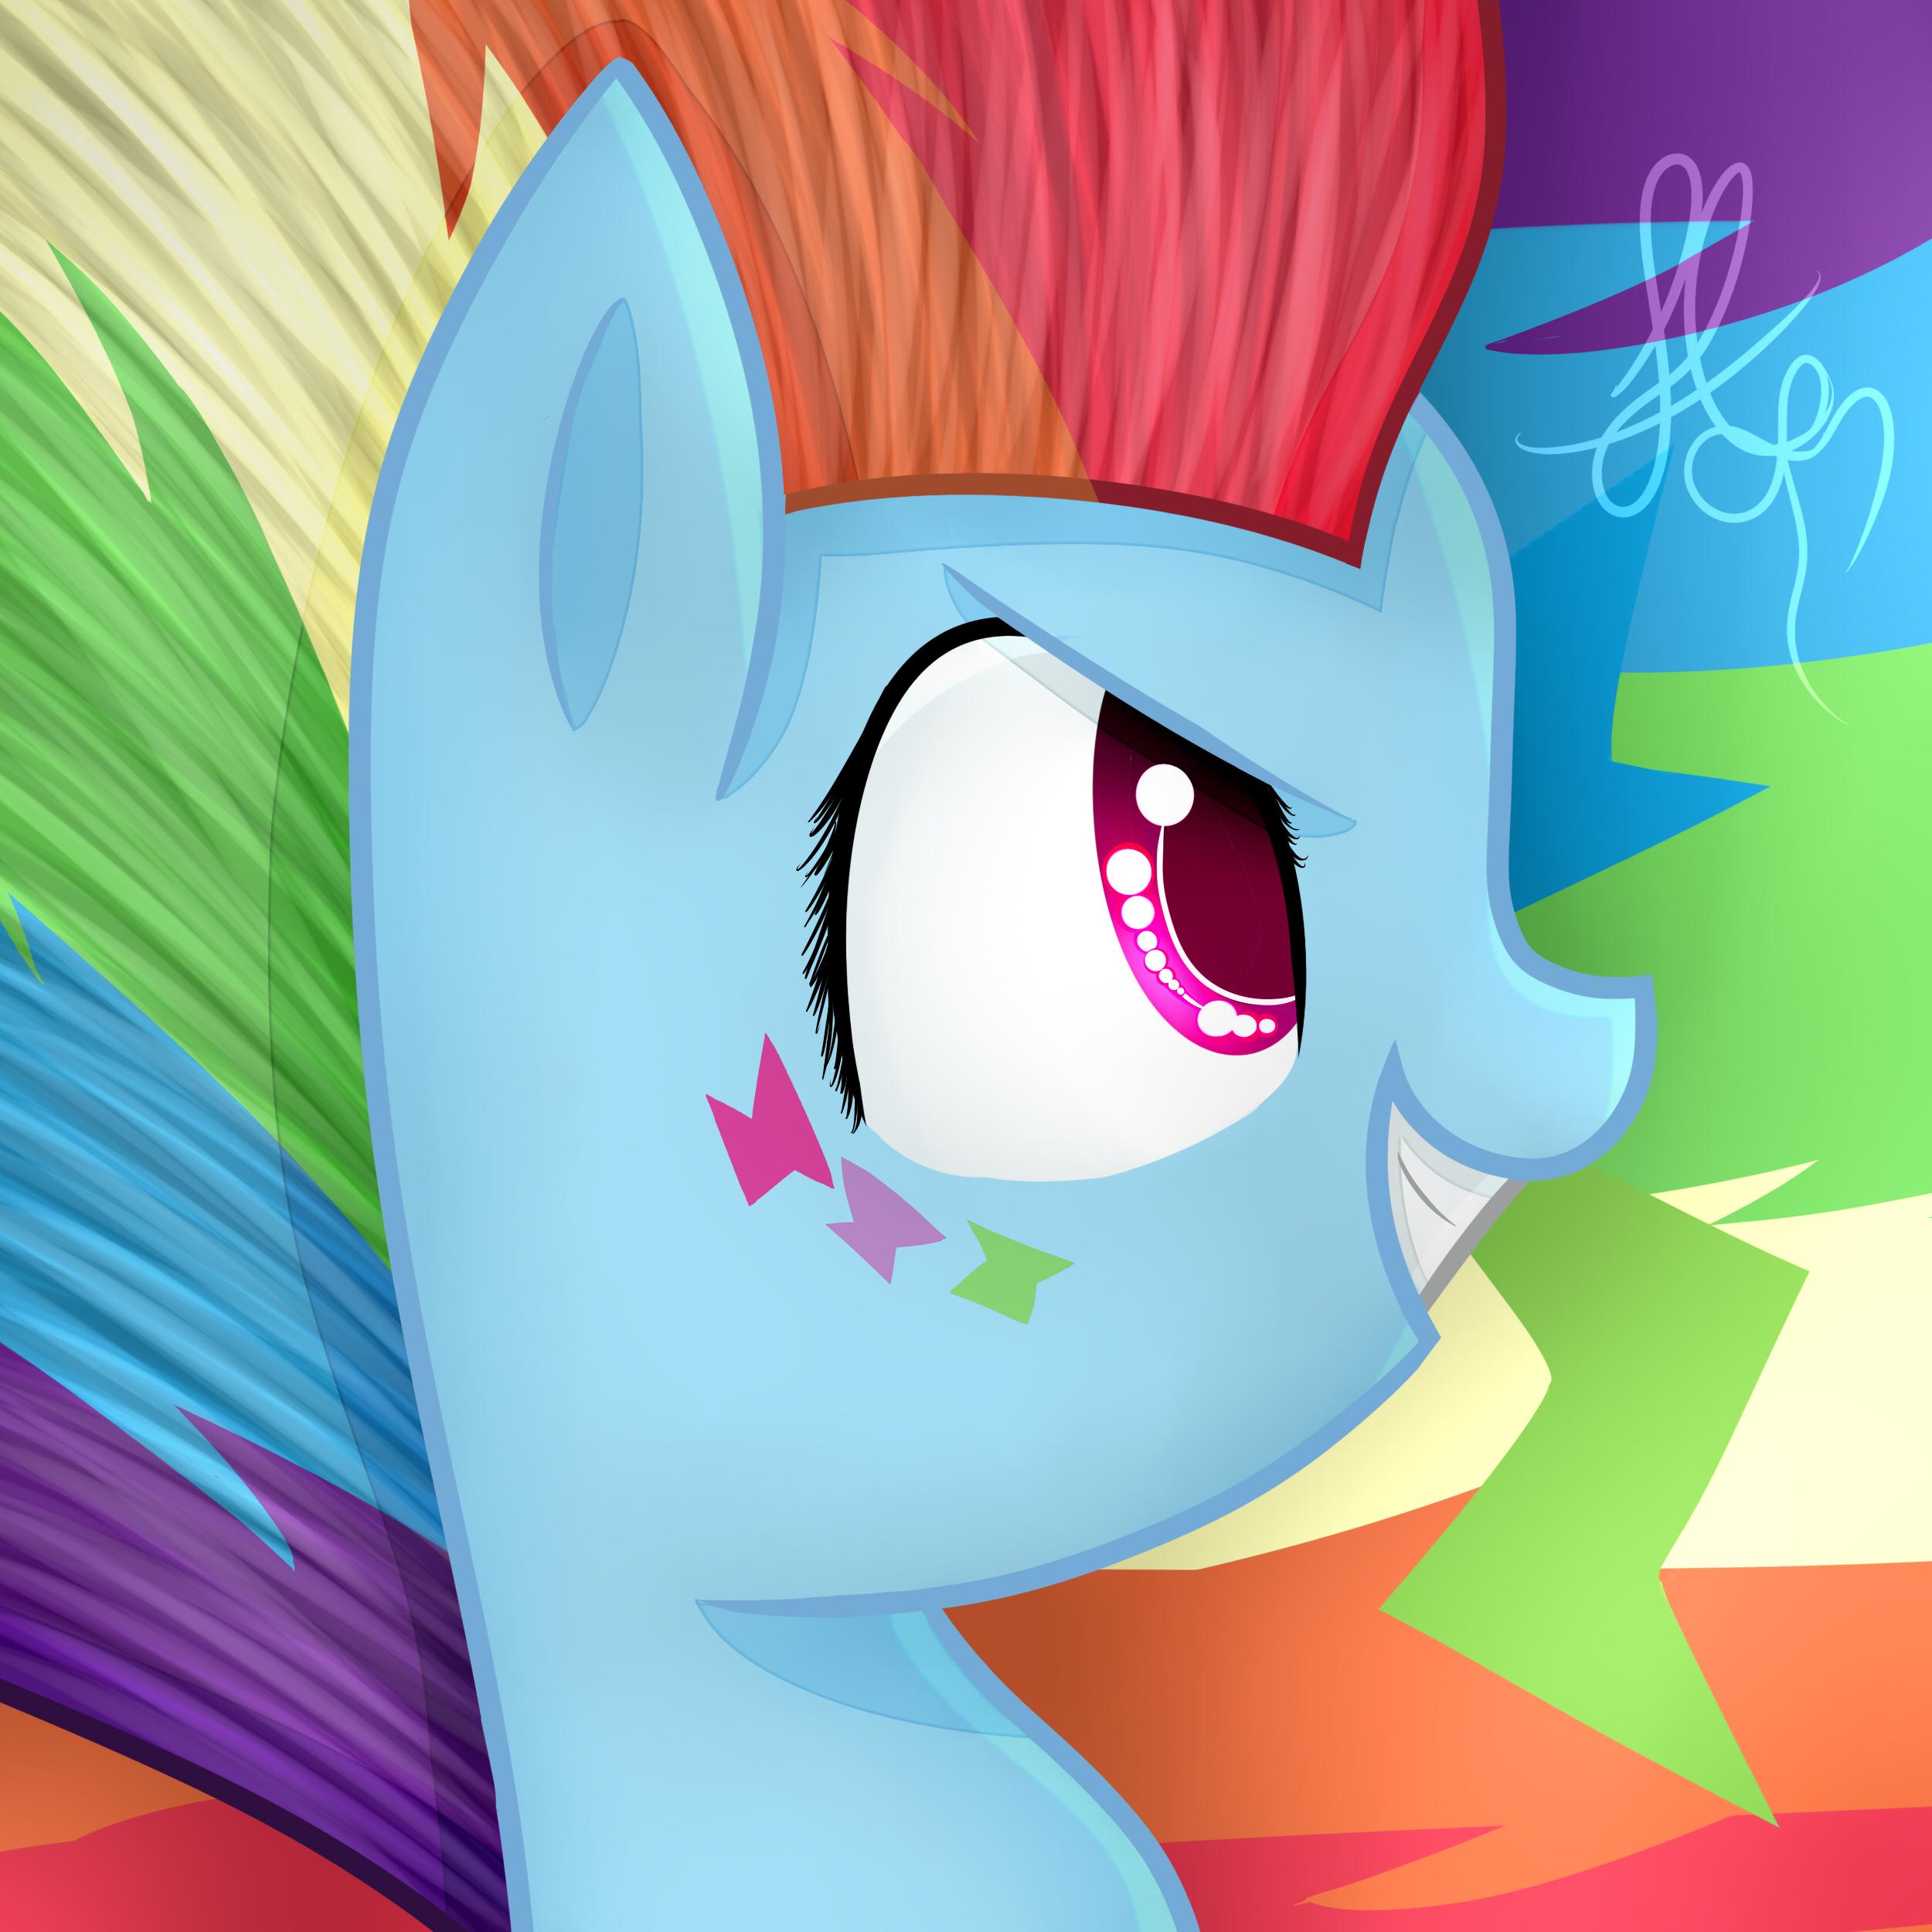 rainbow_dash_rainbow_power_by_applejacks2-d8dbkck.jpg (2500×2500)